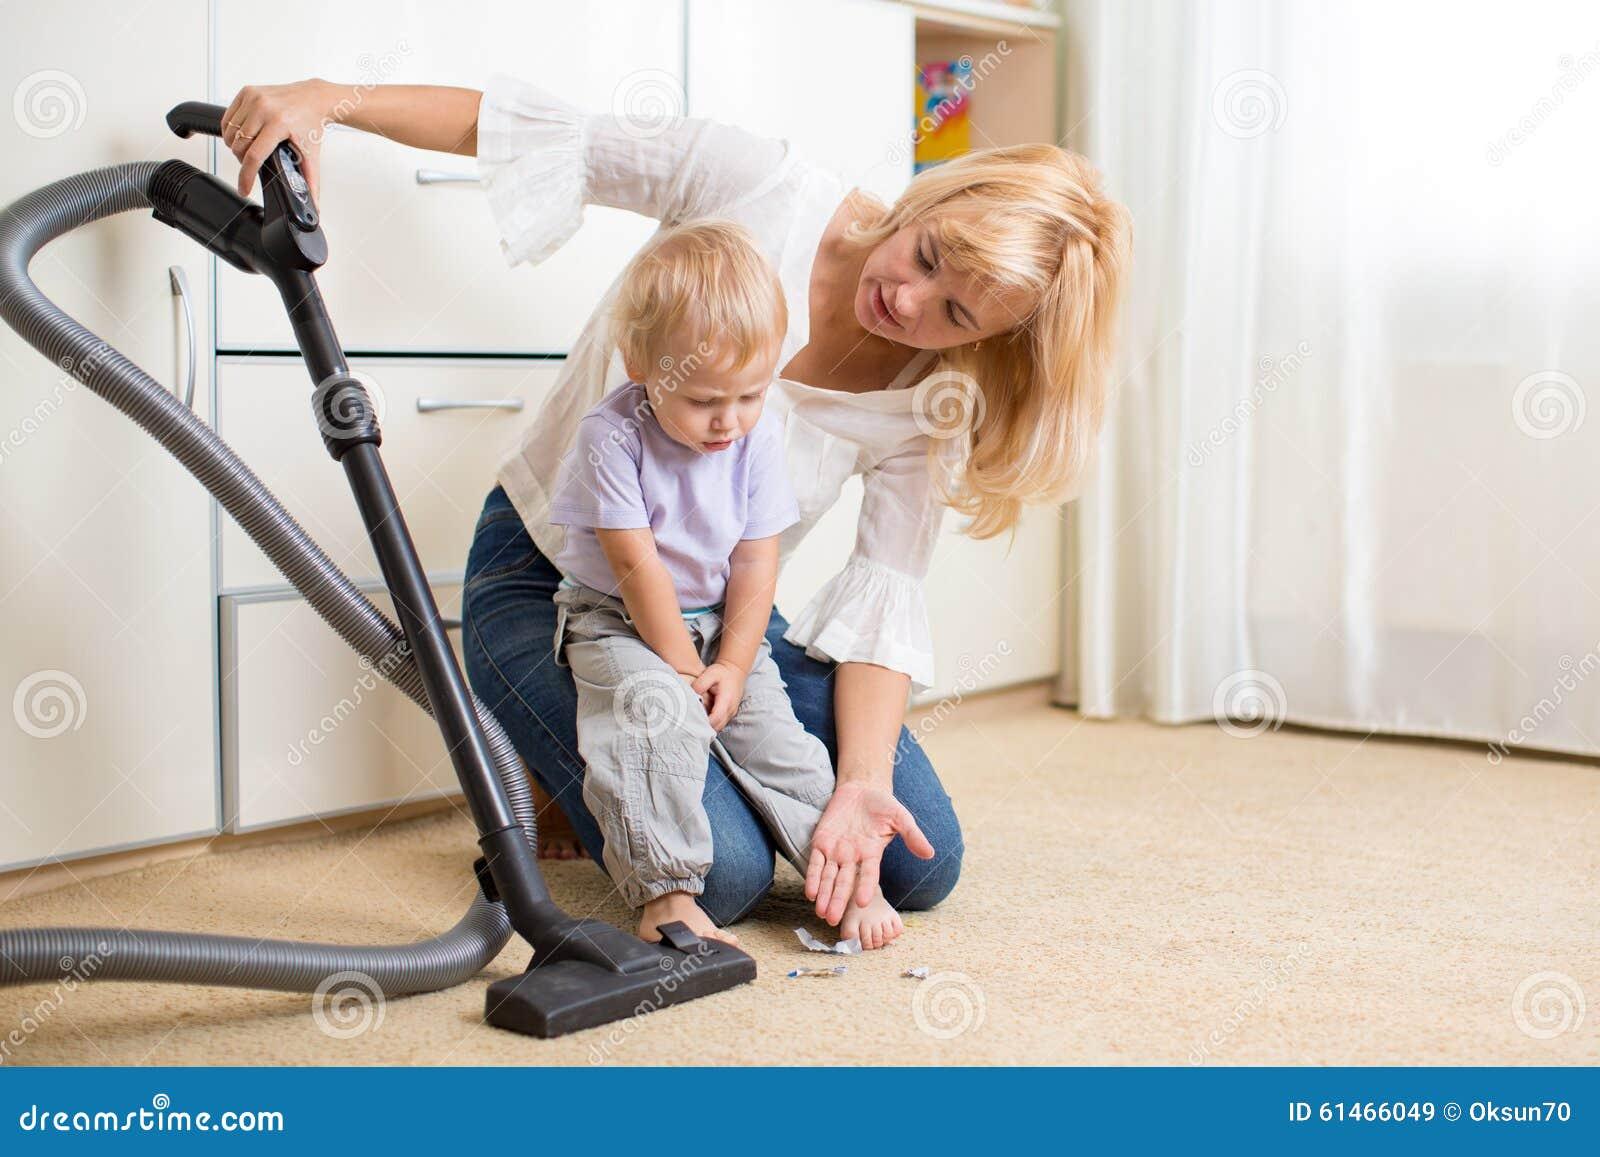 видео мама учит сына еб